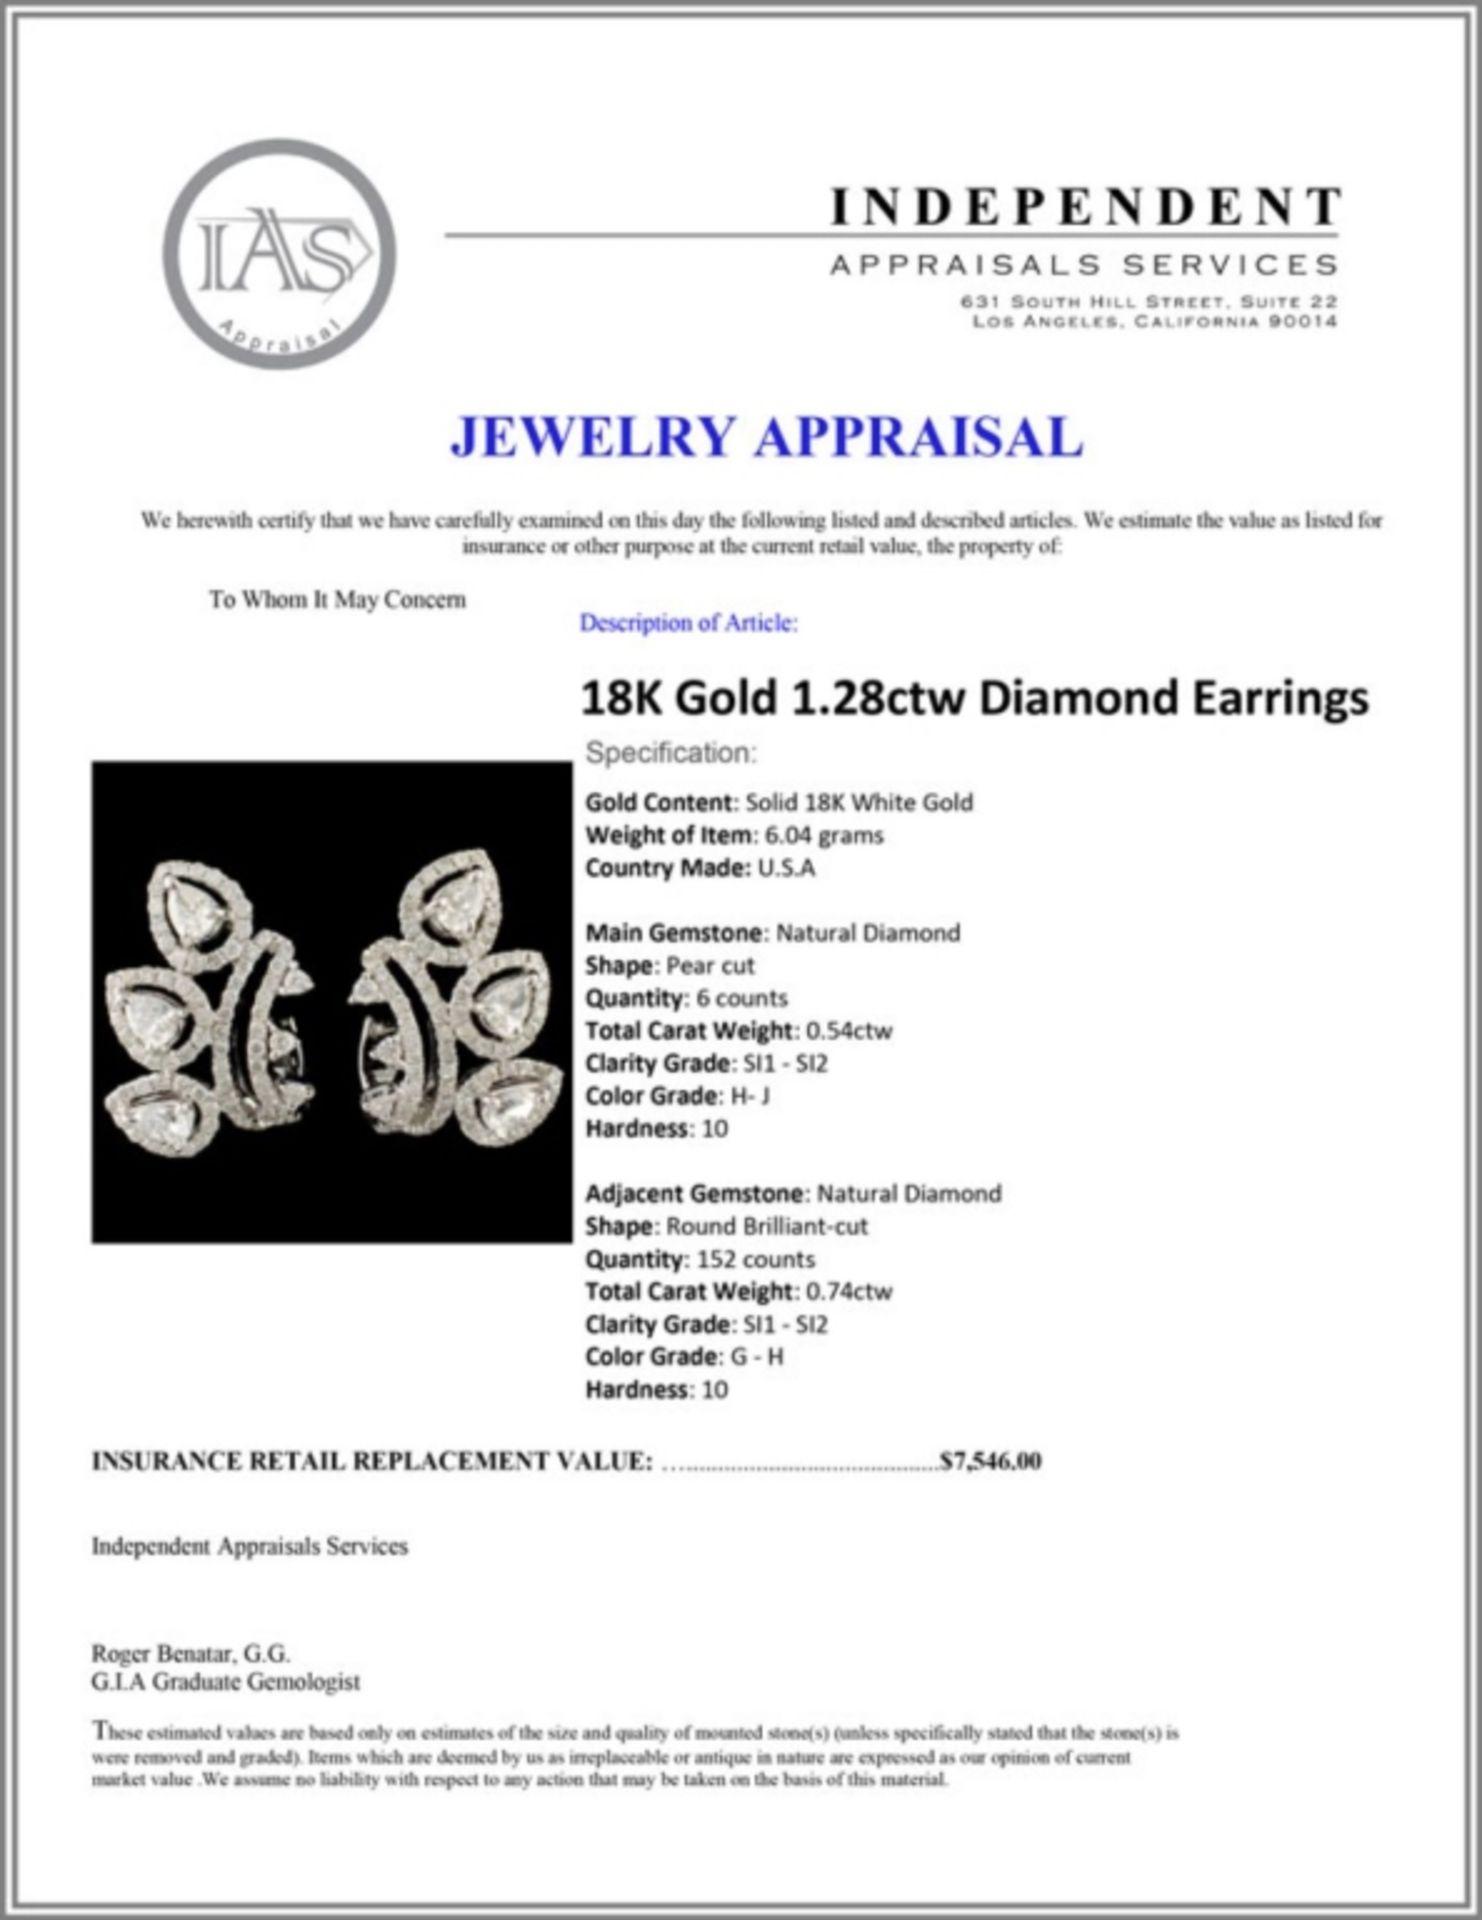 18K Gold 1.28ctw Diamond Earrings - Image 3 of 3